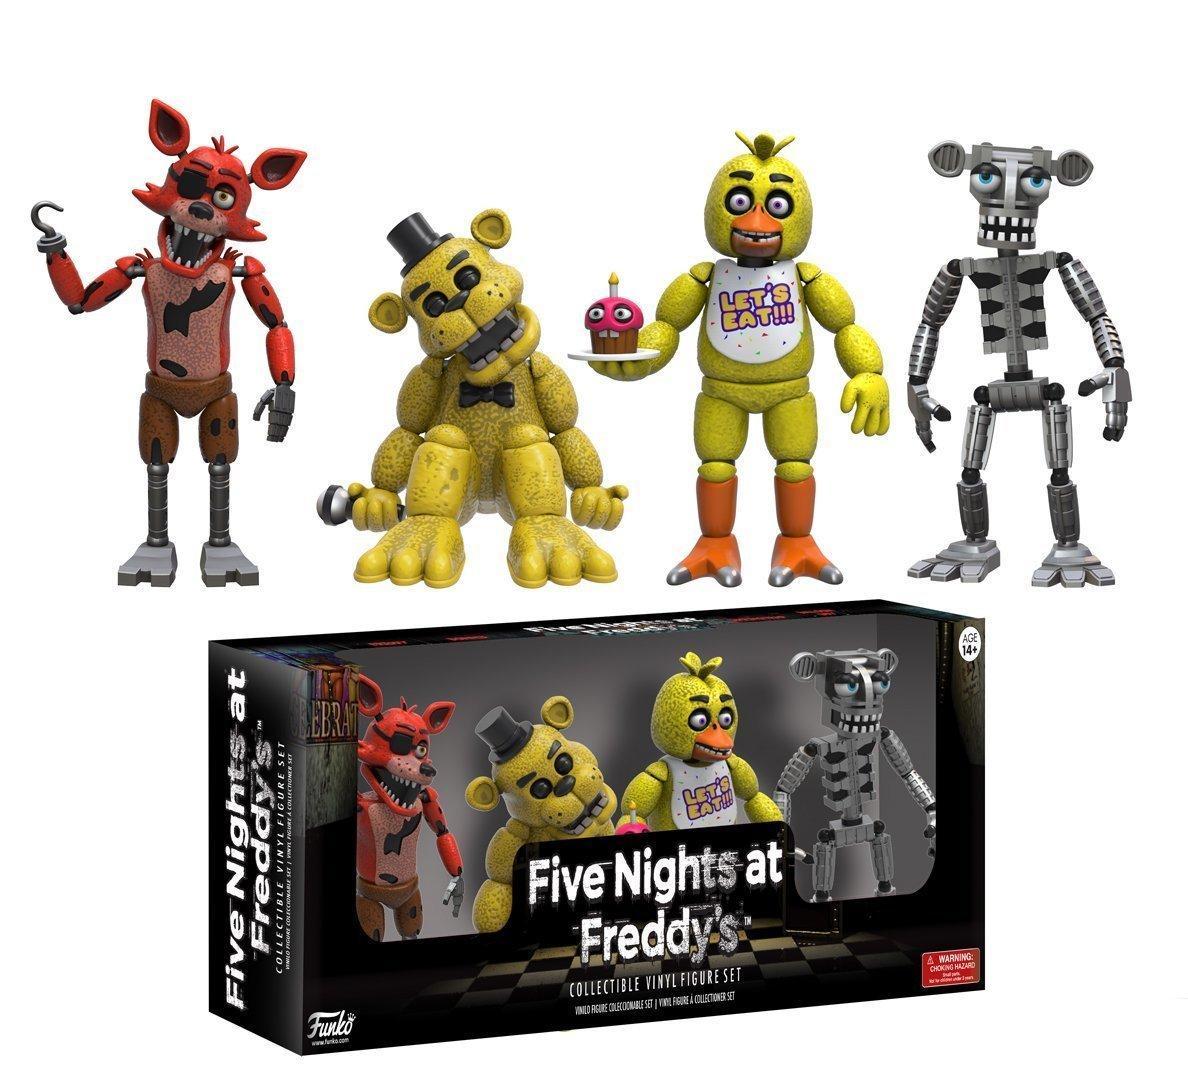 Фигурки 5 ночей с Фредди / набор Funko Five Nights at Freddy's